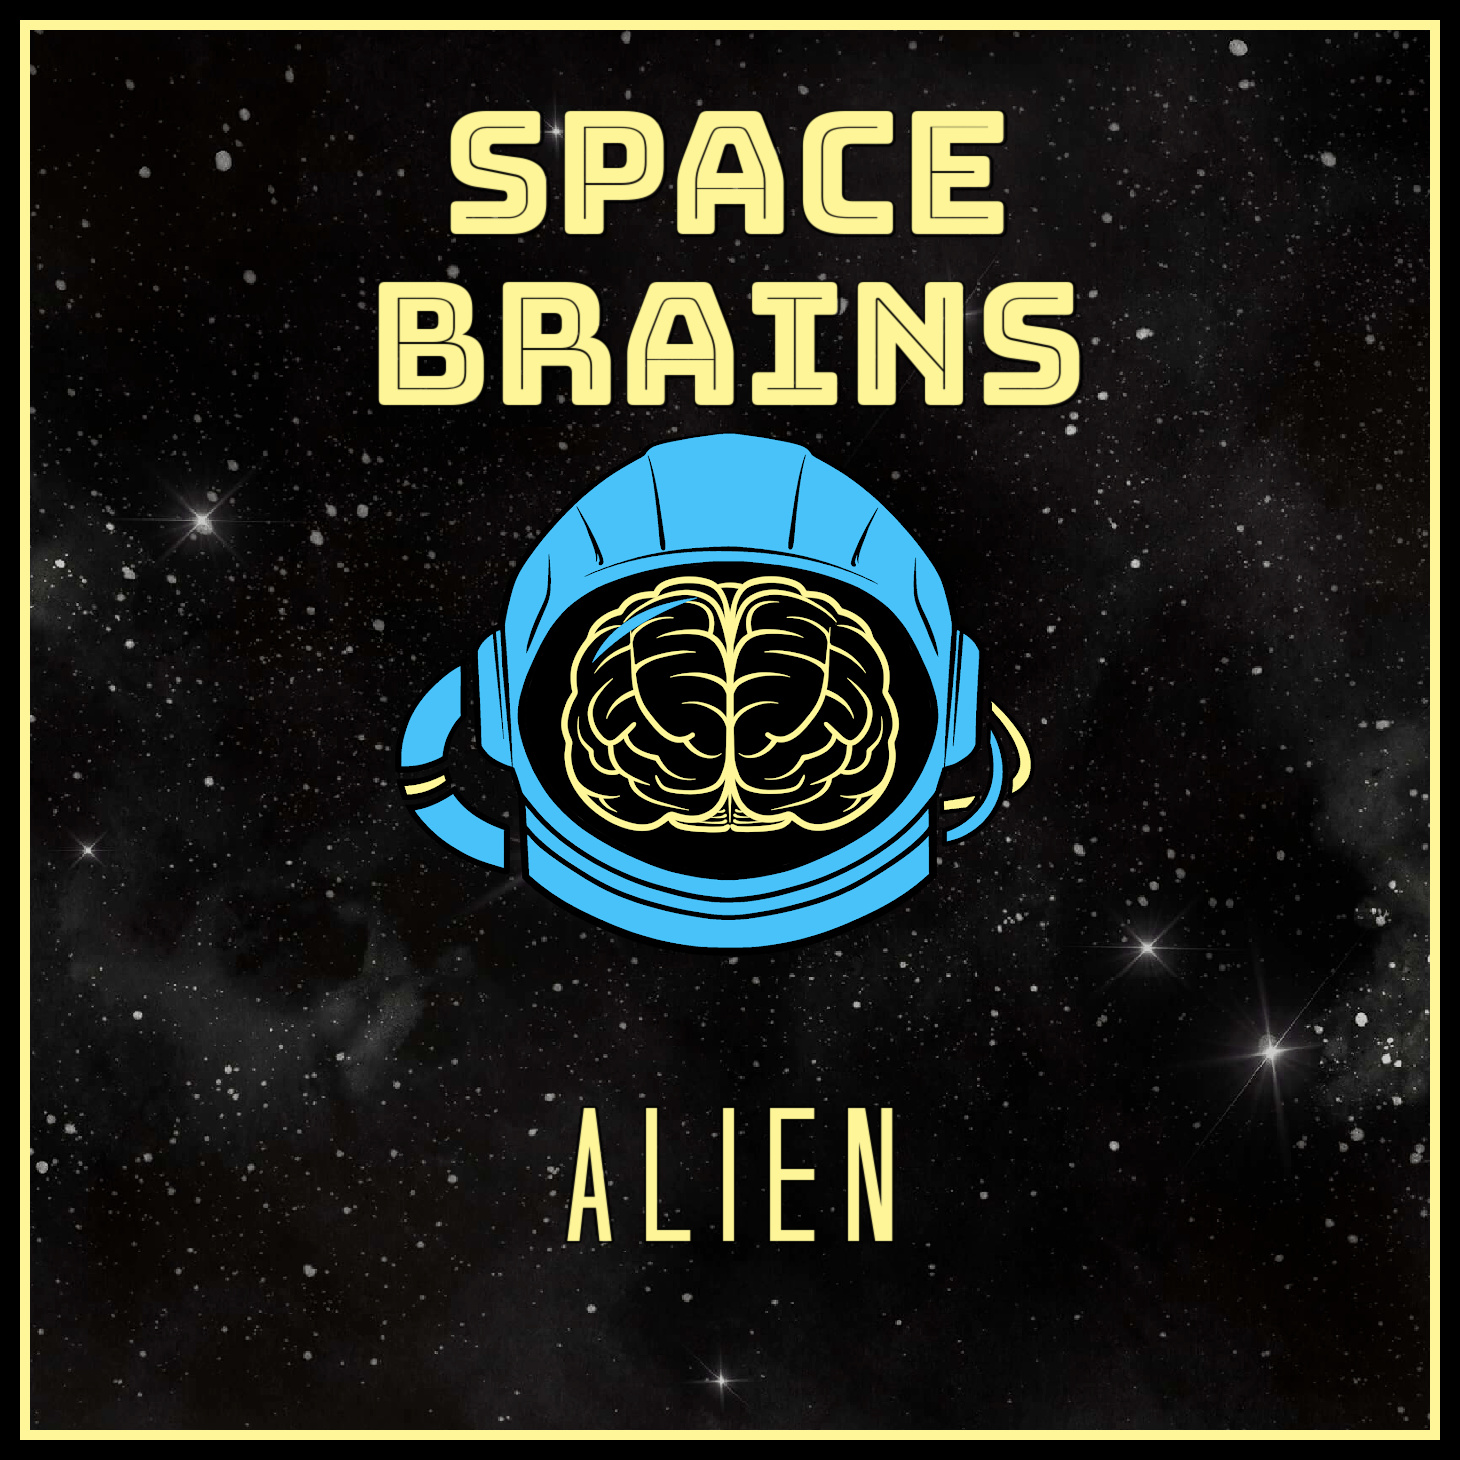 Space Brains - 5 - Alien